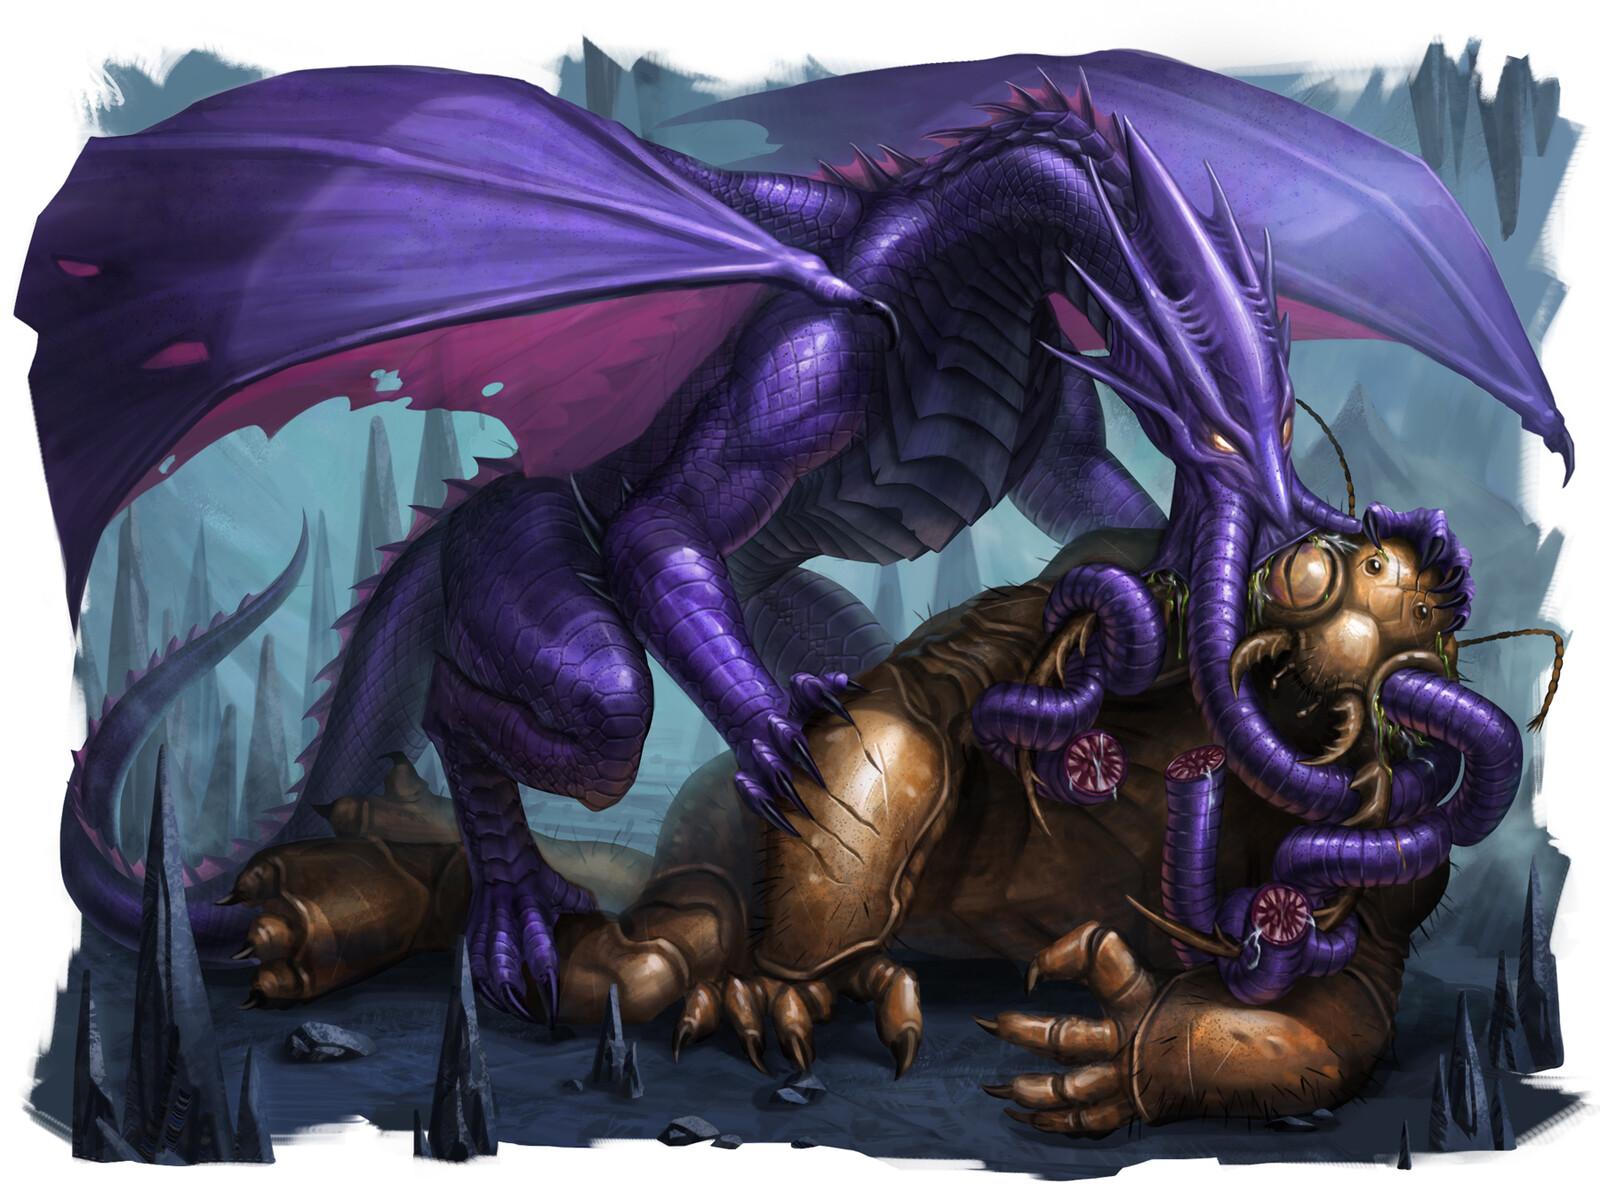 Lithidragon / Brainstealer Dragon (Young)